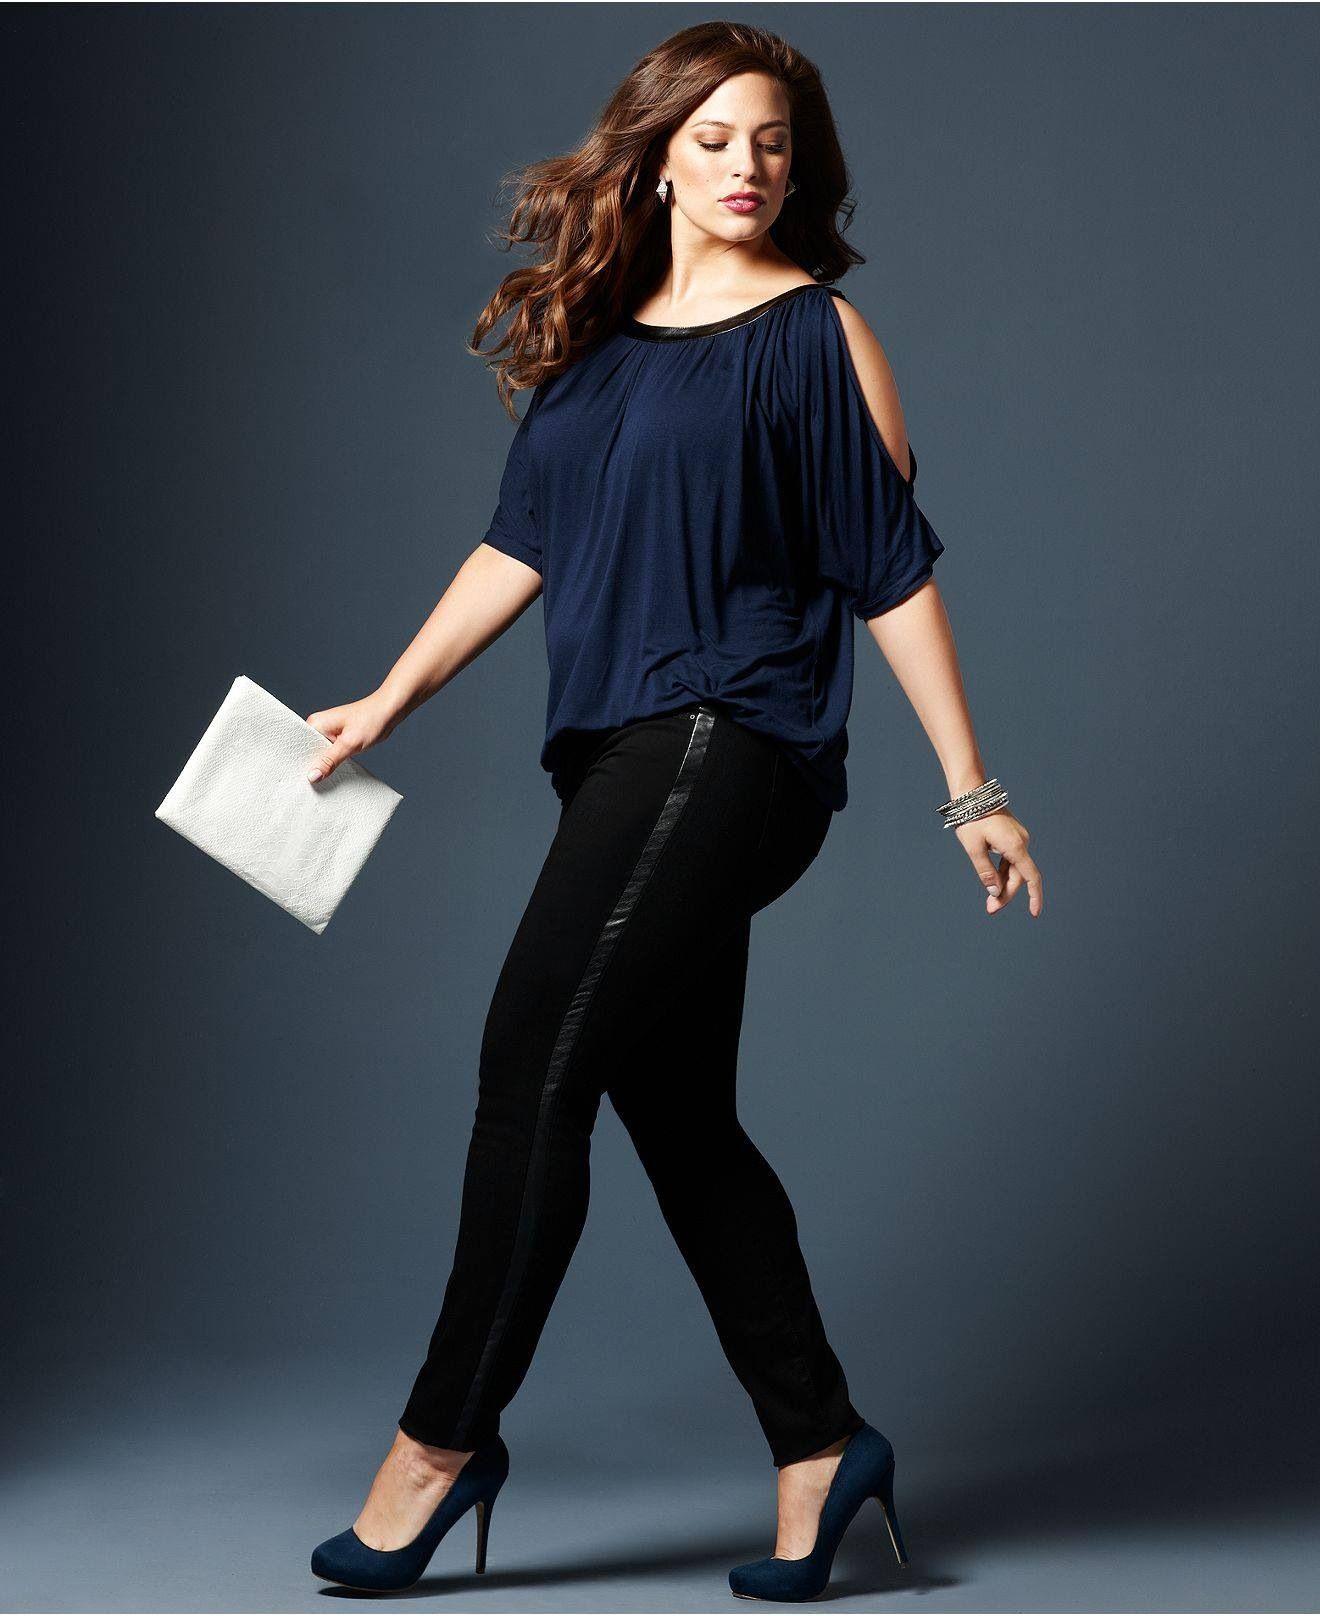 Plus size fashion skinny jeans 31